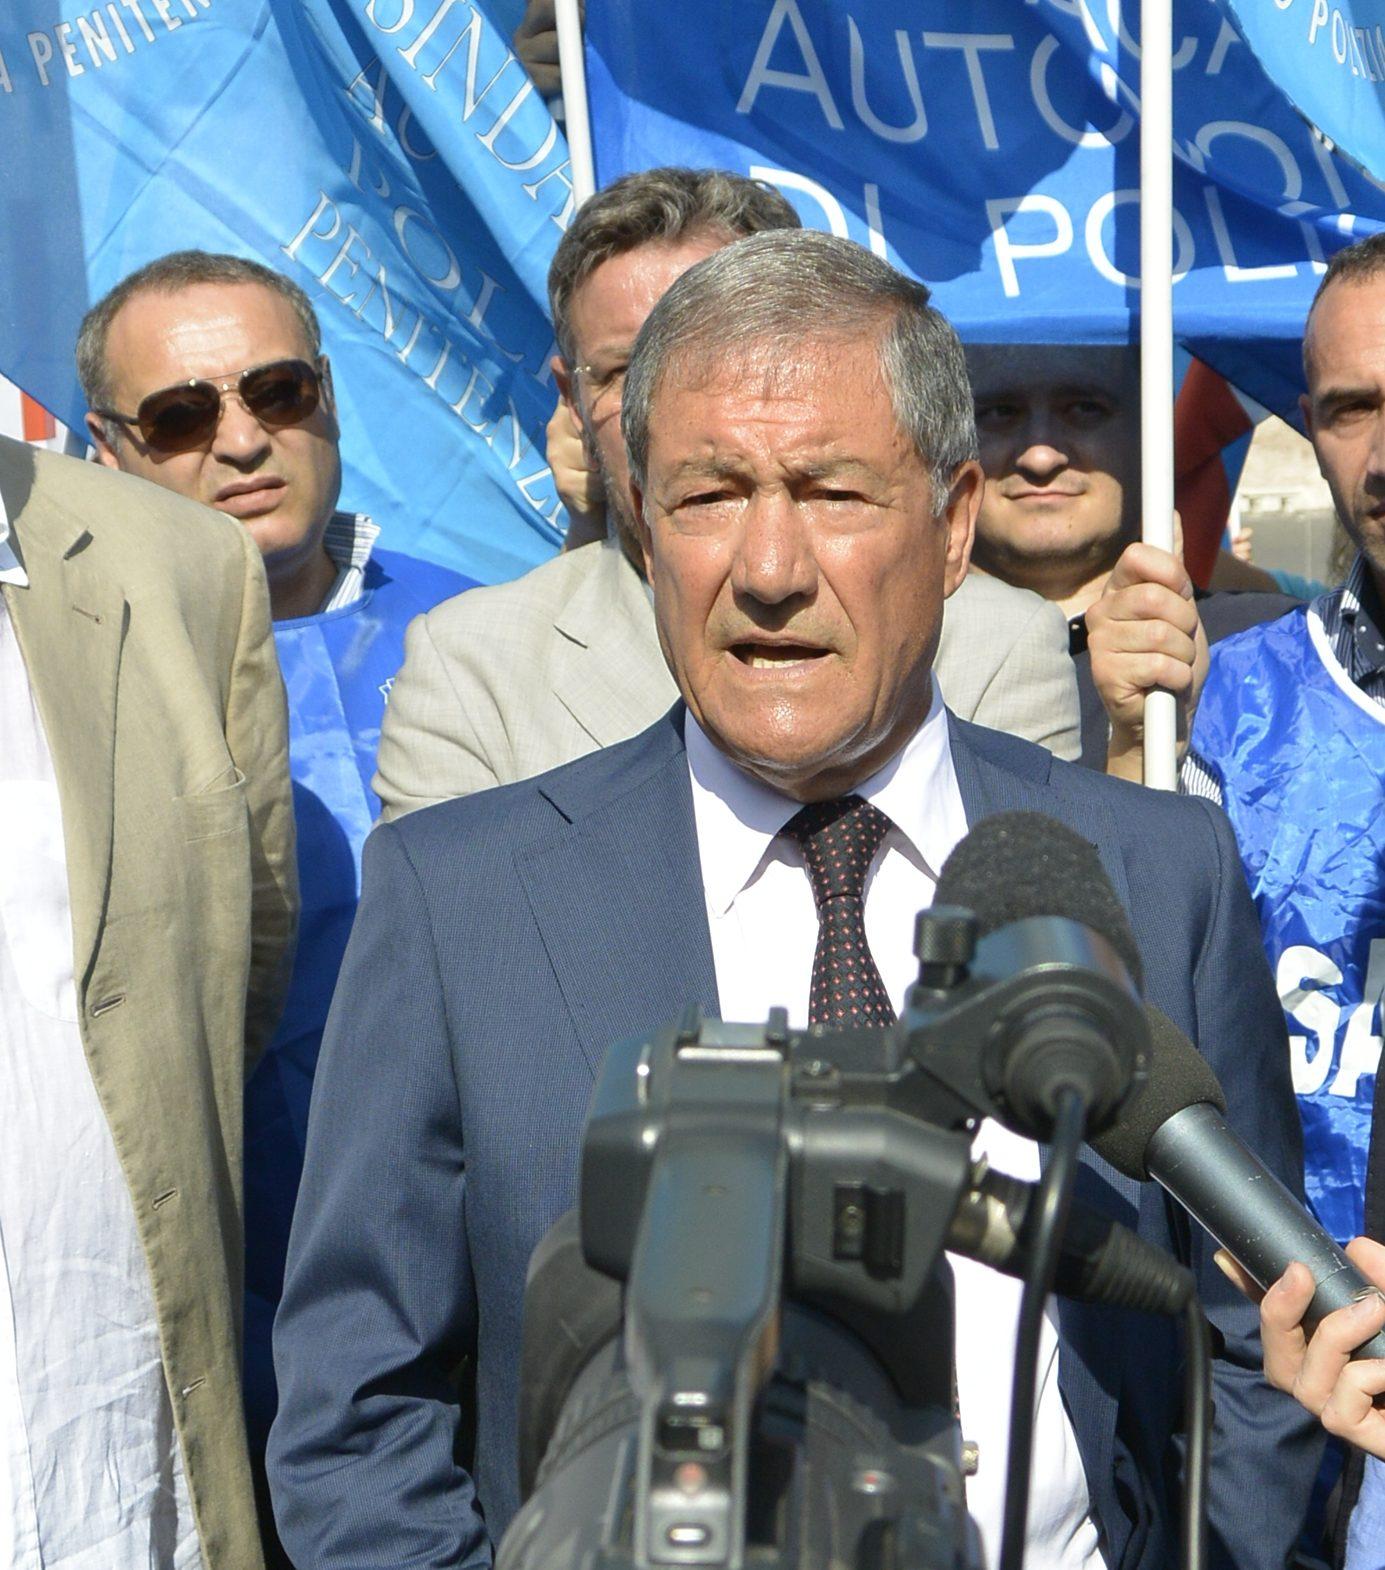 Penitenziari, Capece: «Servono riforme»